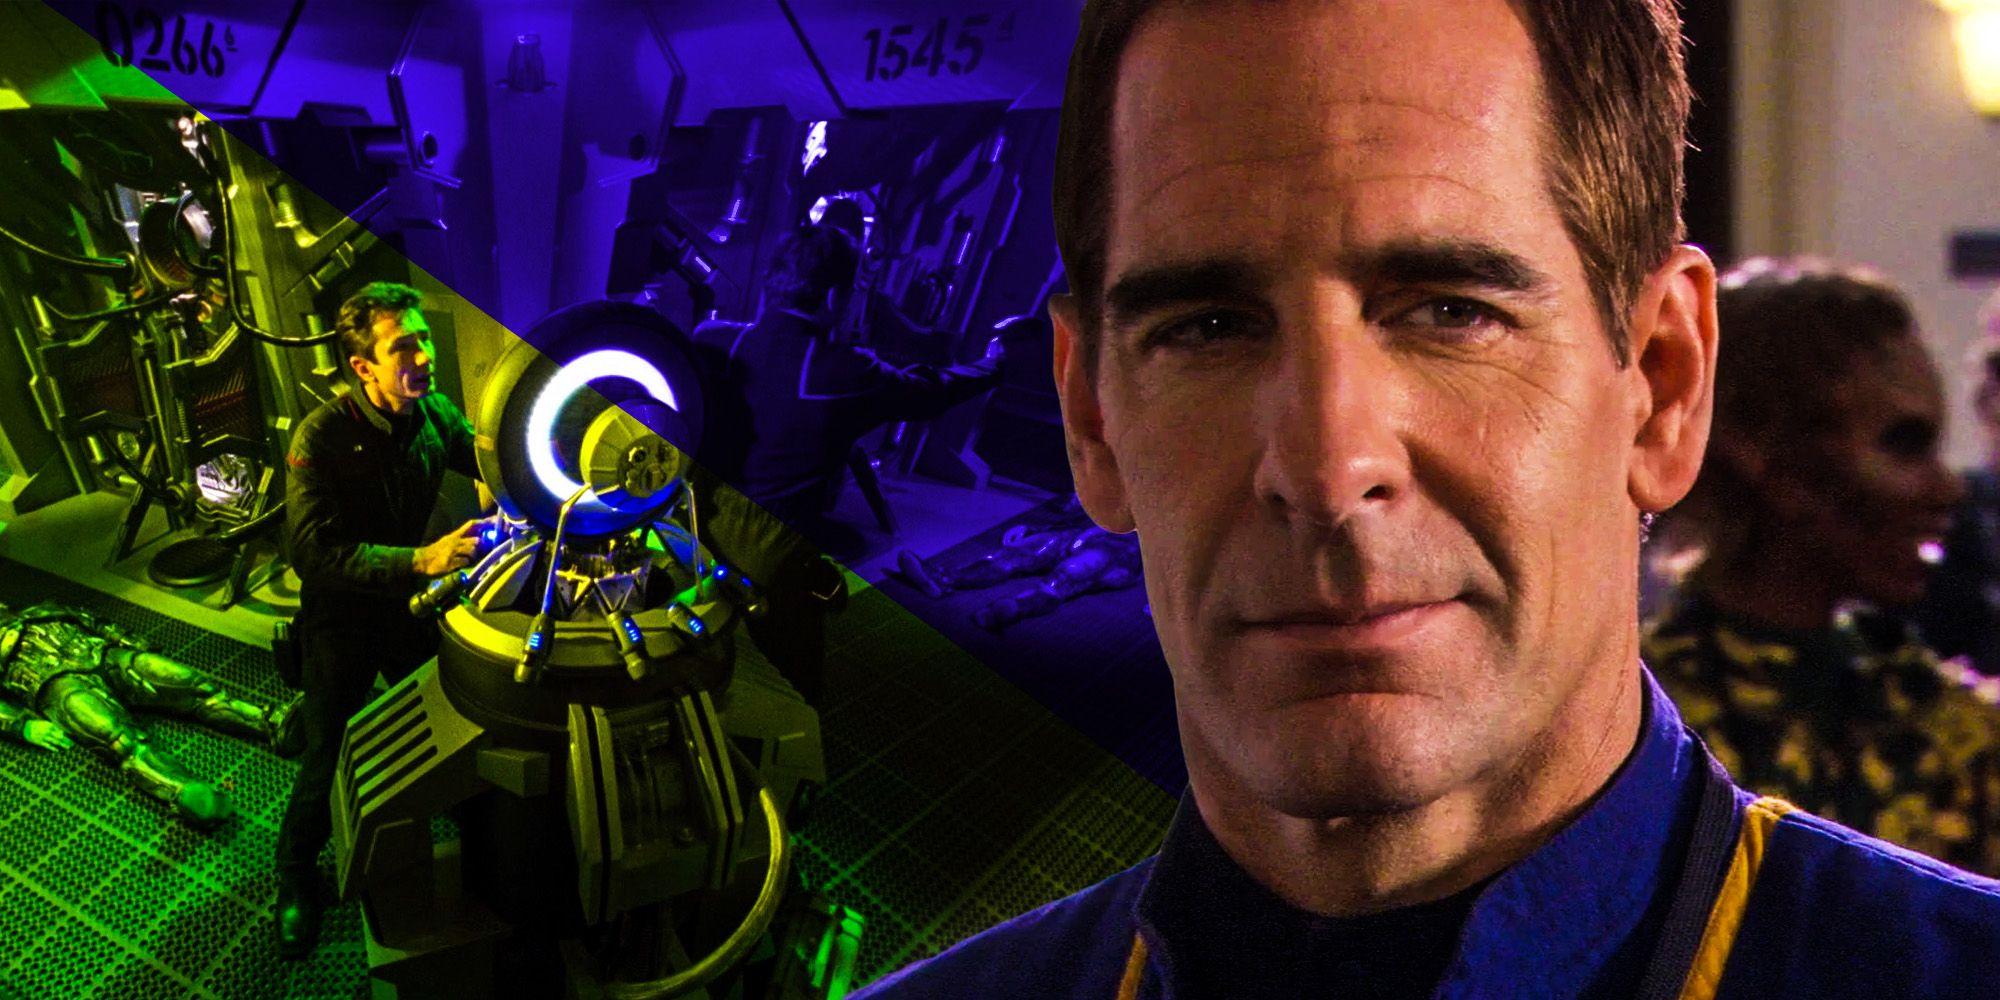 Star Trek: Enterprise's Borg Episode Rewrote TNG History